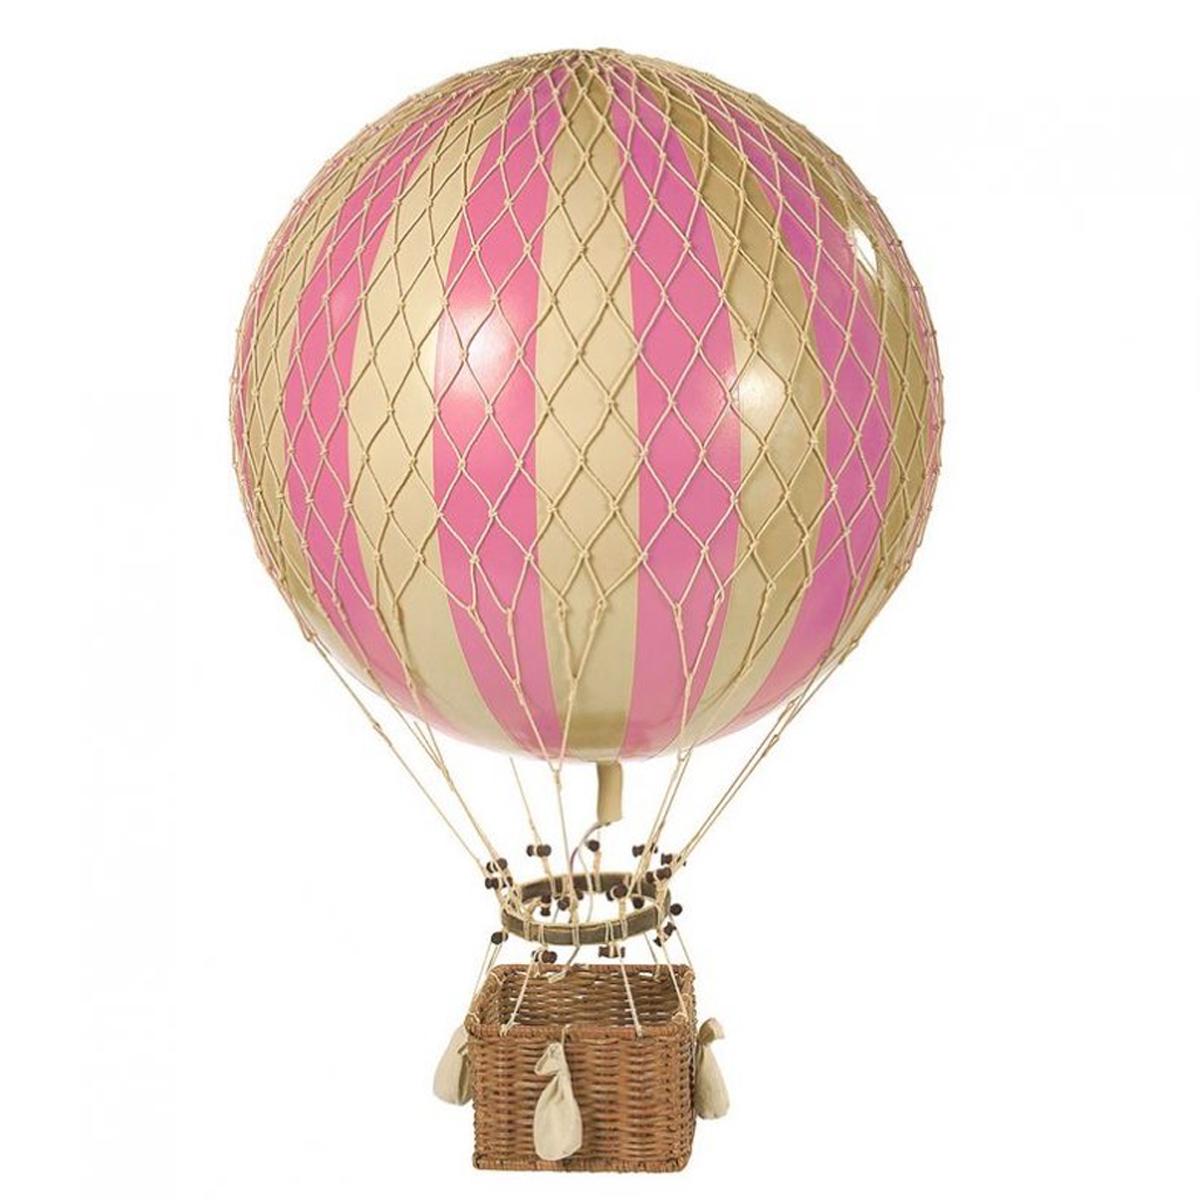 Image of Authentic Models luftballon 32 cm - rosa